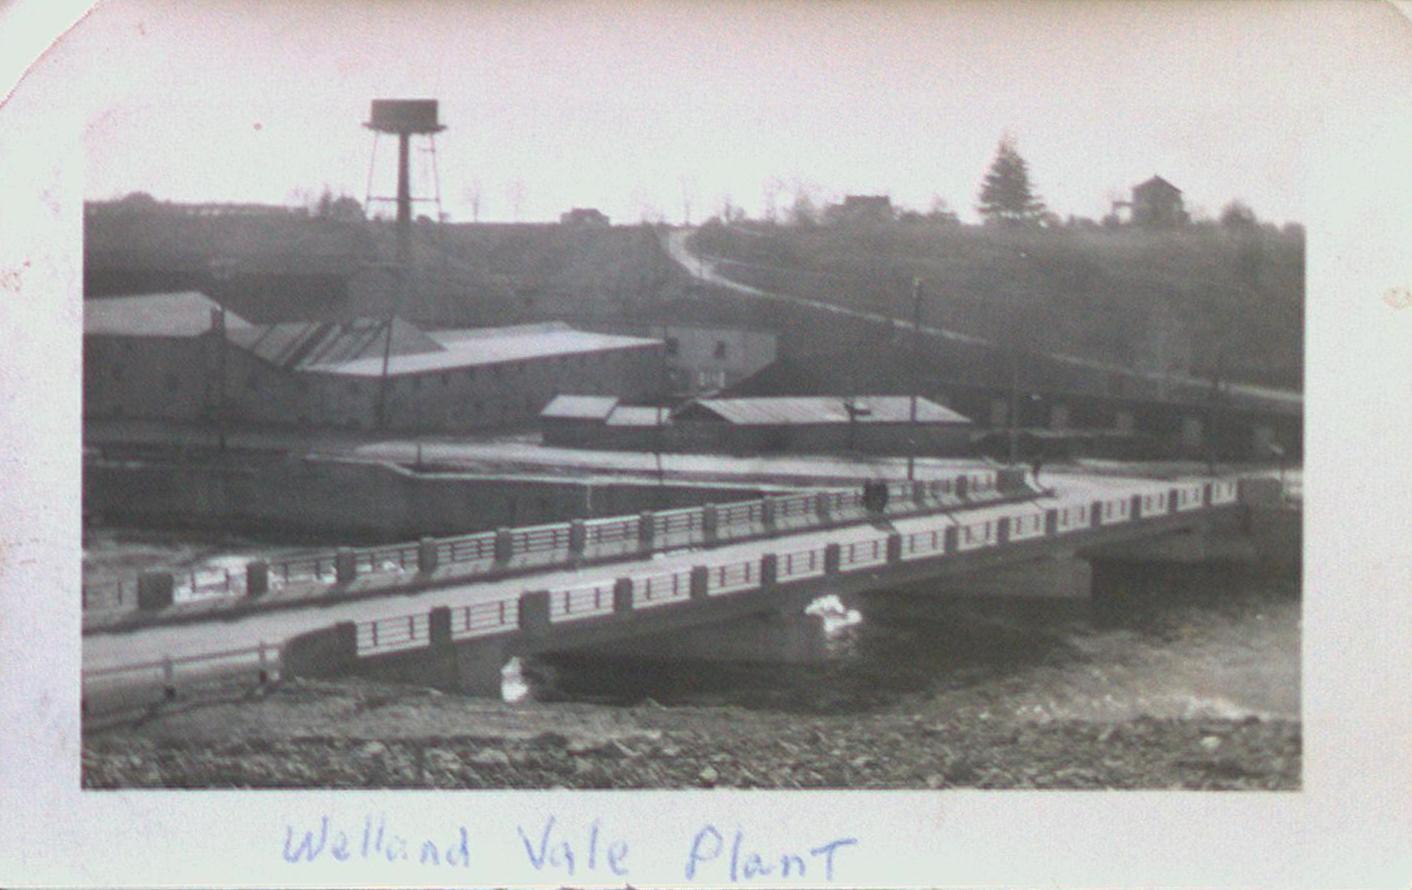 Welland Vale Plant